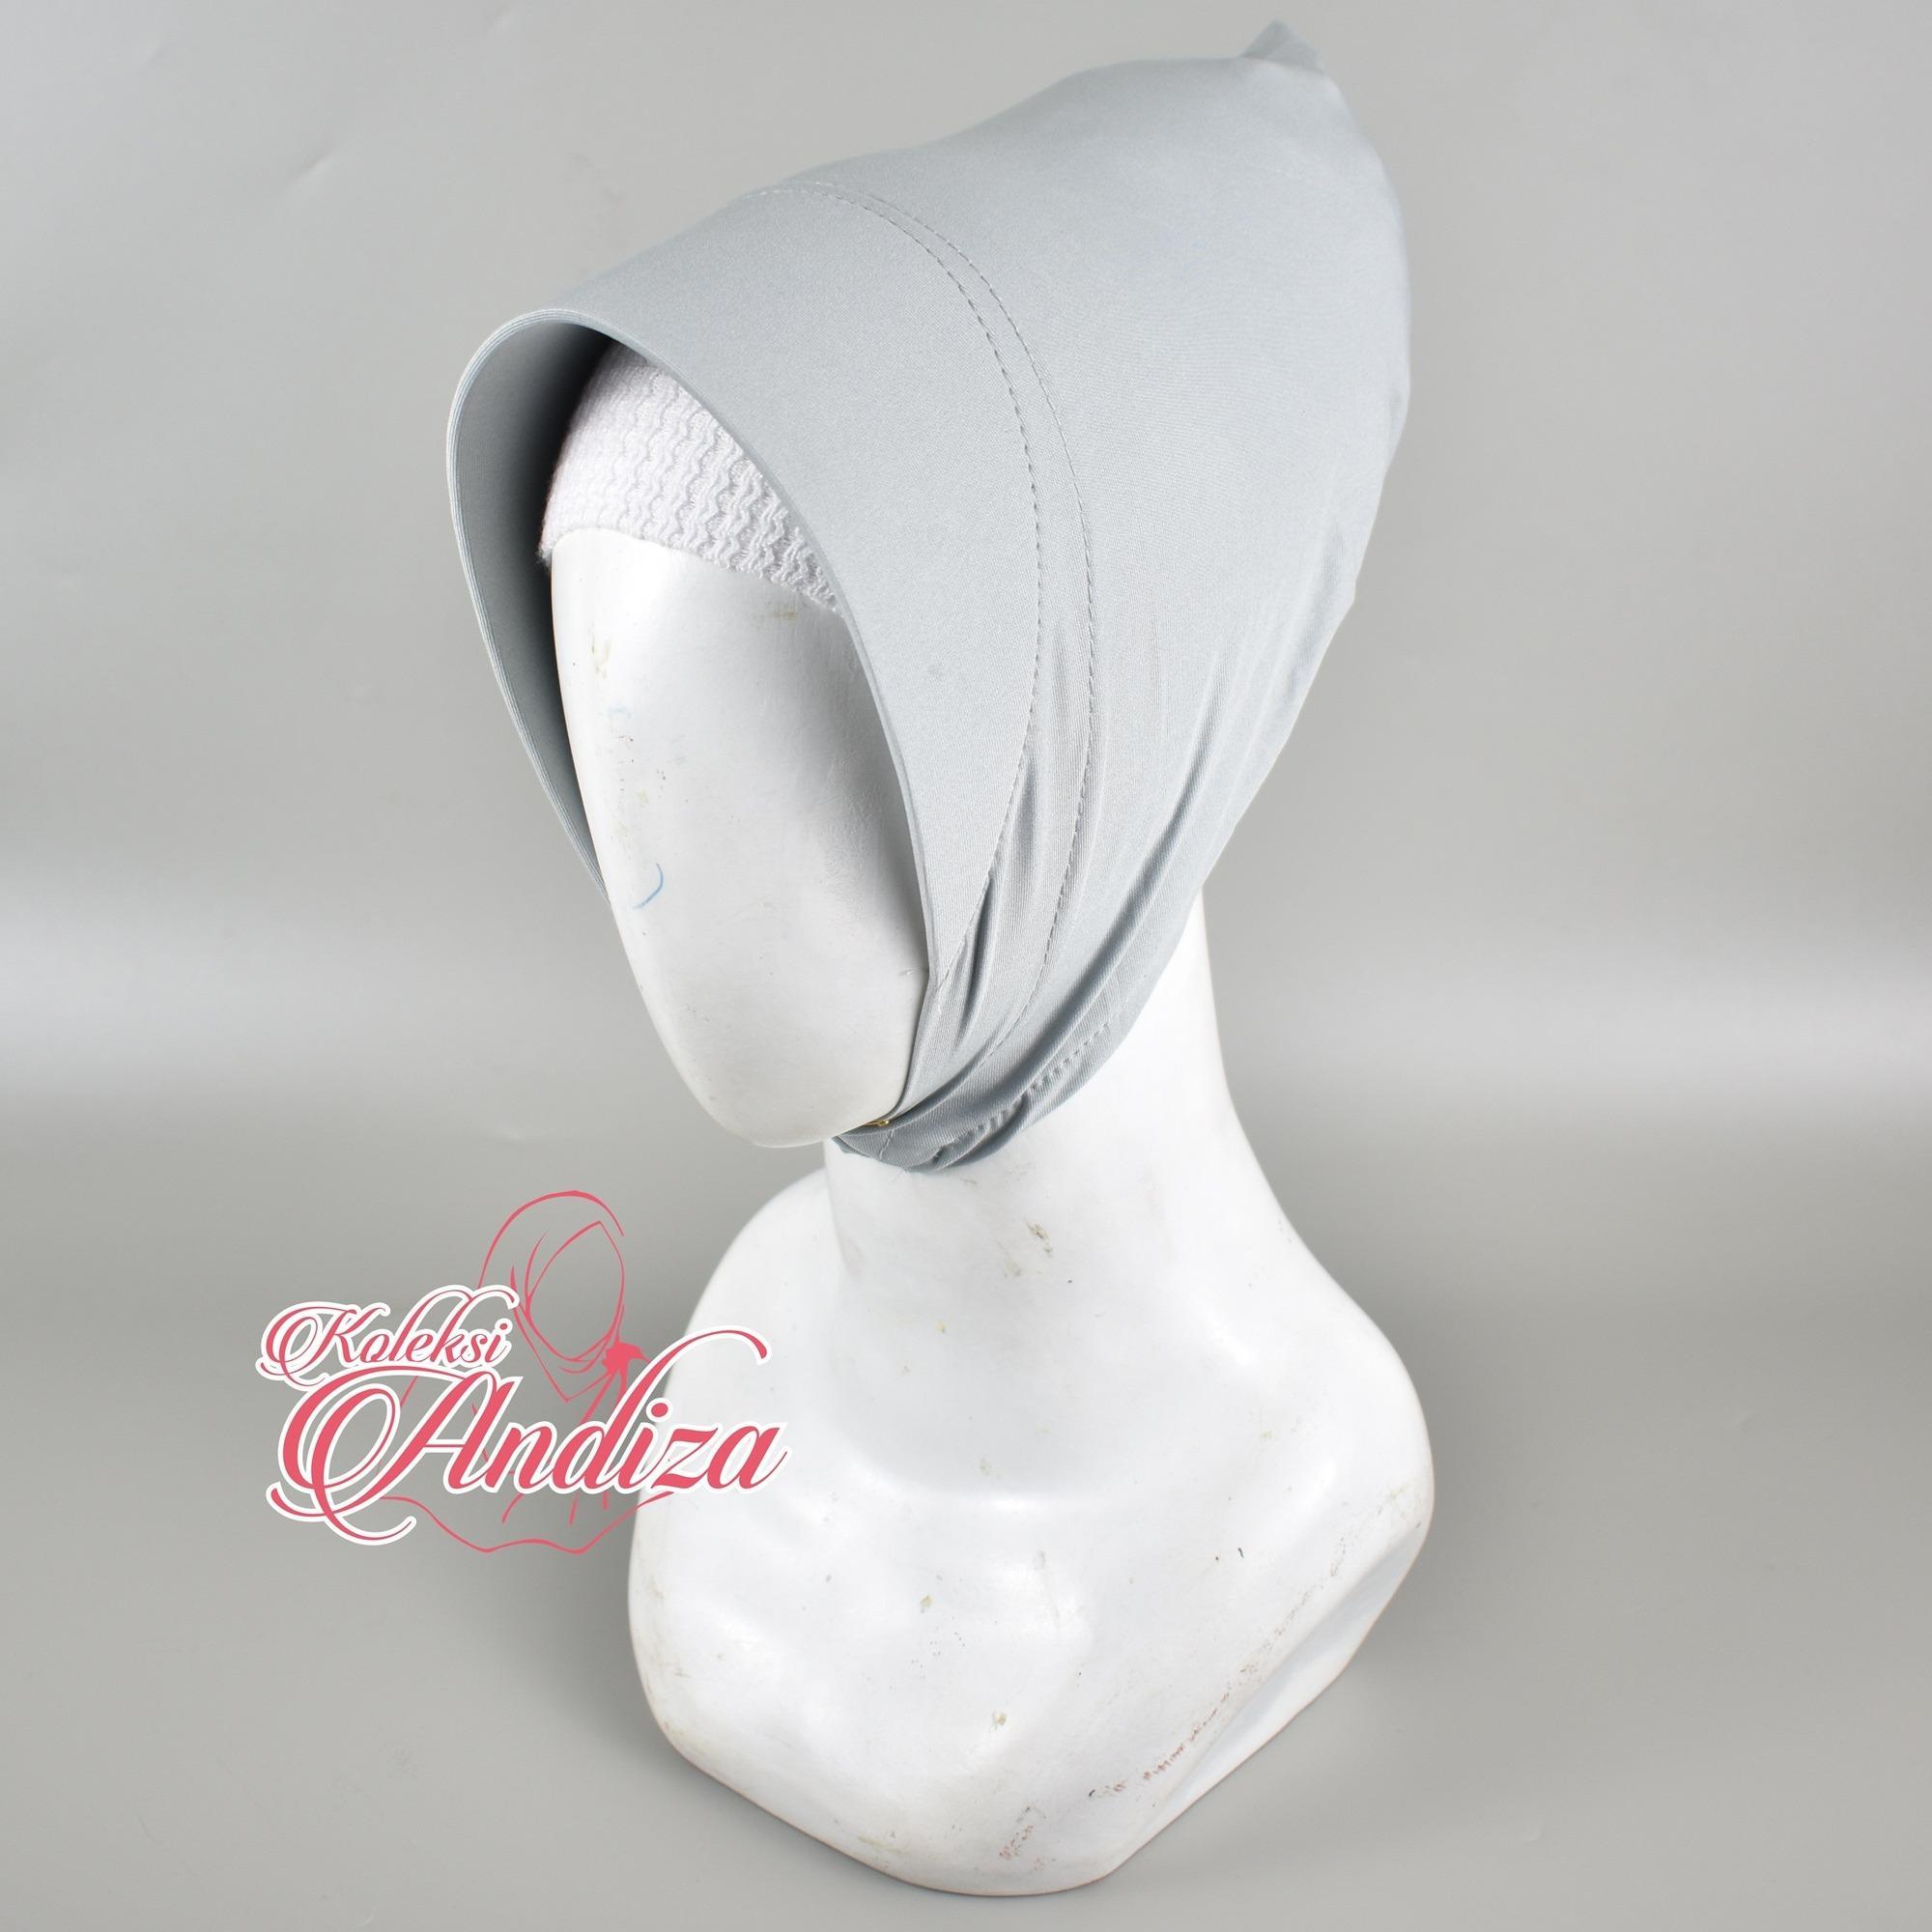 Beli Hemat Harga Diskon Premium Jilbab Hijab Kerudung Instan Aisyah Serut Andiza Ciput Marsha Anti Tembem Pad Antem